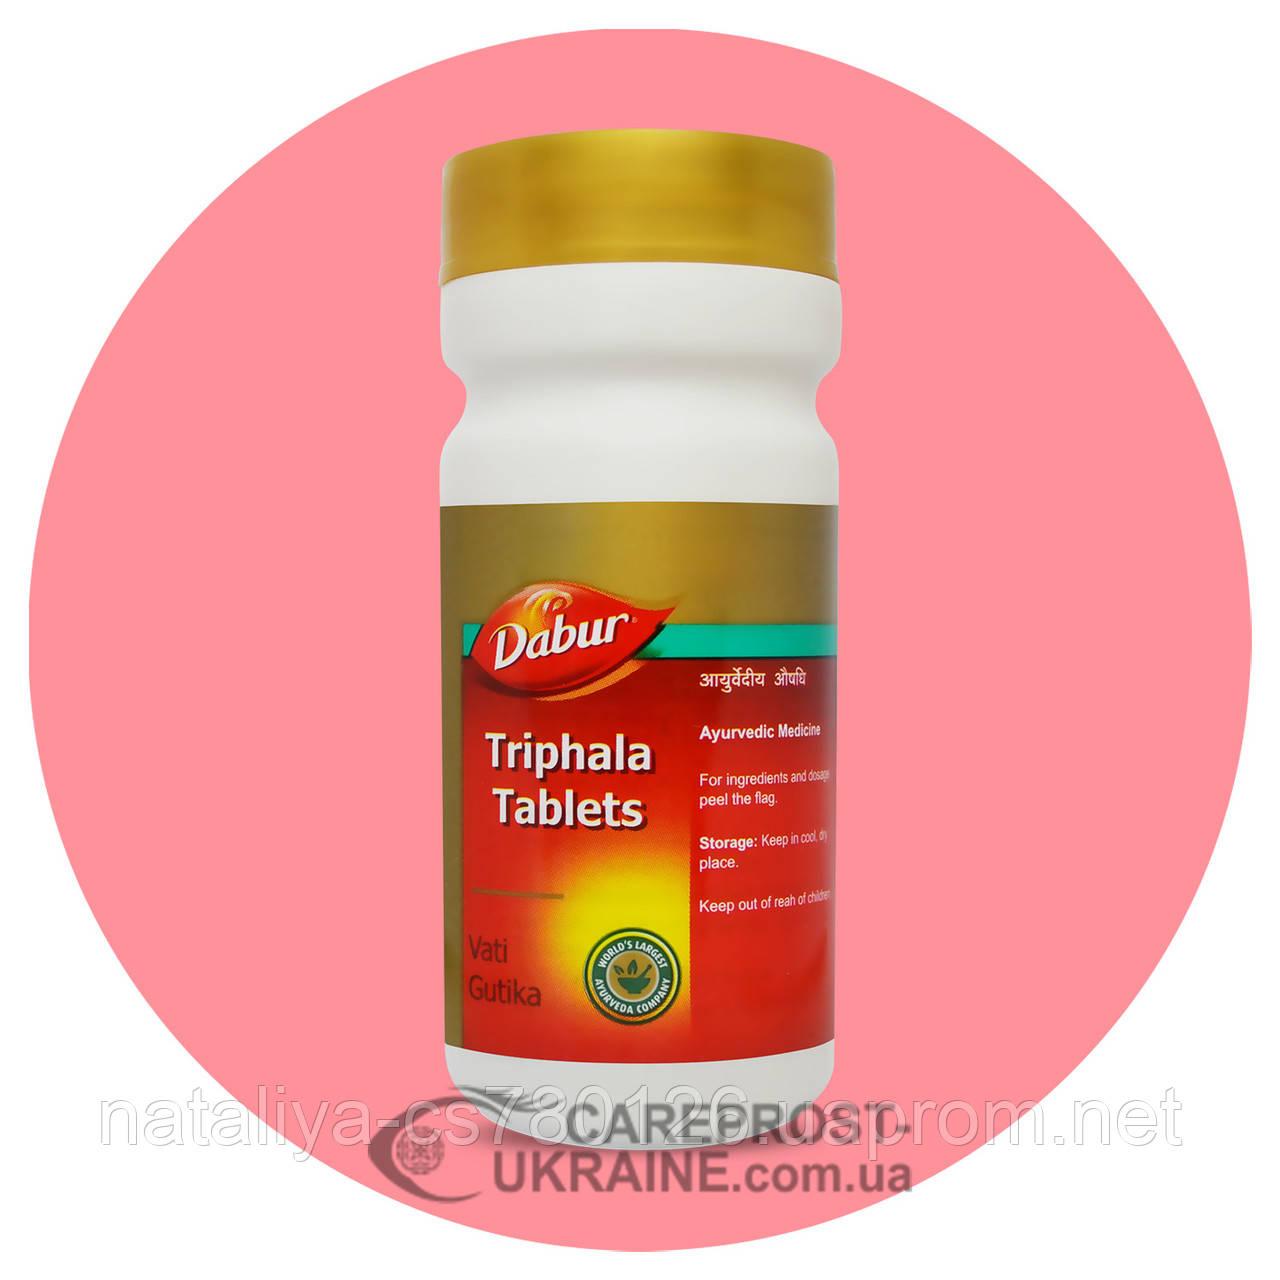 Трифала Дабур (Triphala Tablets Dabur) 60 таблеток